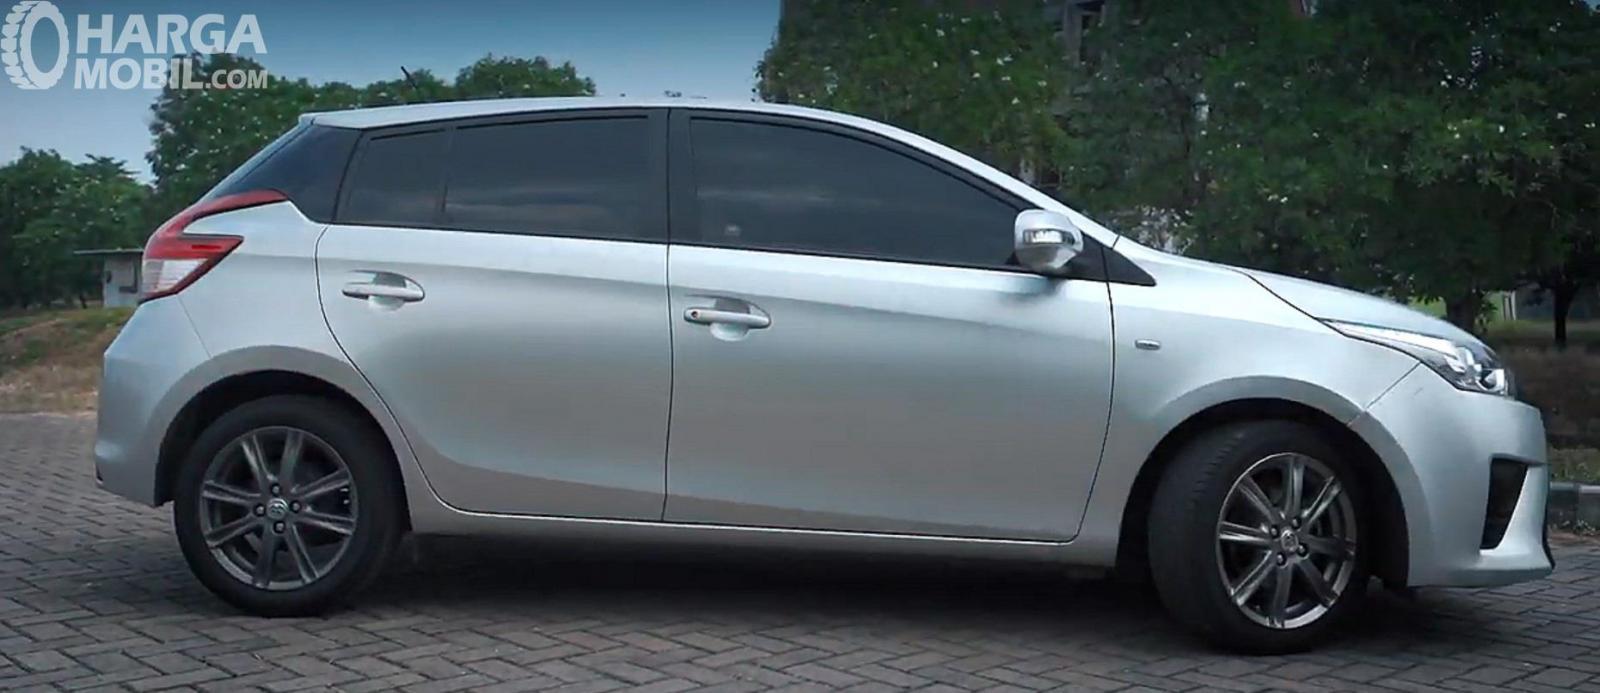 Eksterior Samping Toyota Yaris G AT 2014 tidak memiliki aksen sporty seperti Side Skirt